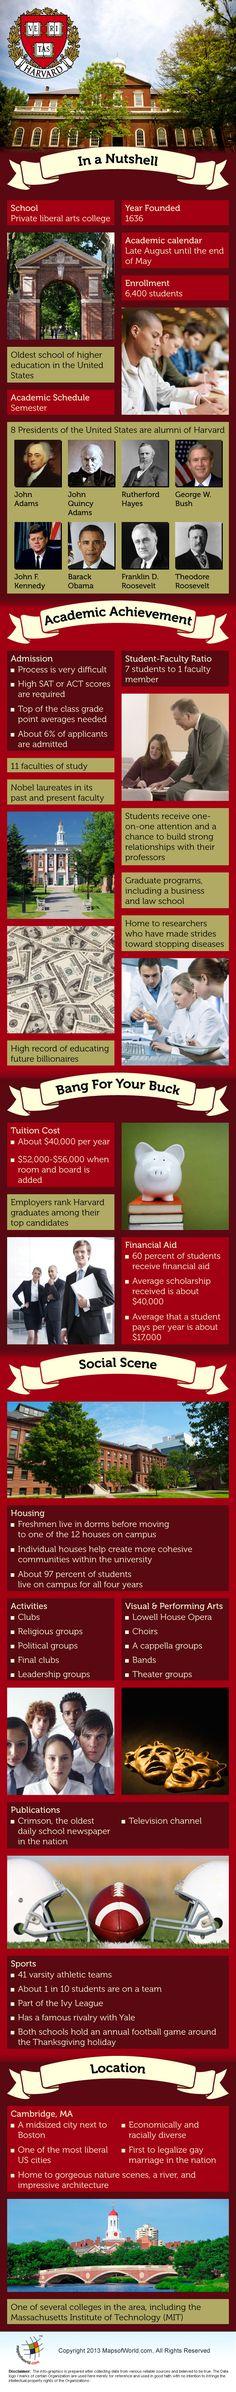 Harvard University #Infographic